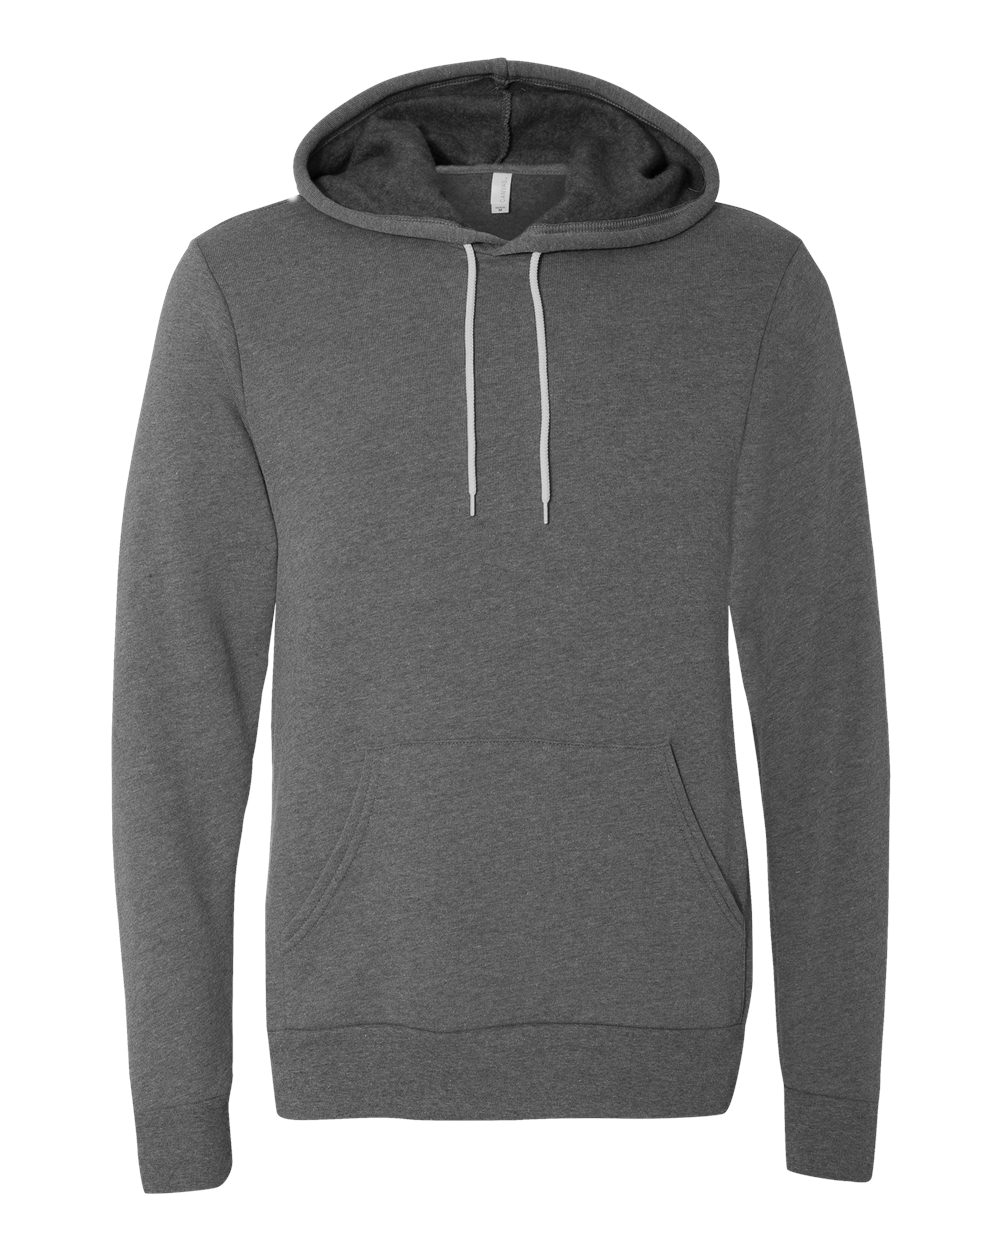 Bella-Canvas-Unisex-Sponge-Hooded-Pullover-Sweatshirt-Blank-3719-up-to-2XL thumbnail 25